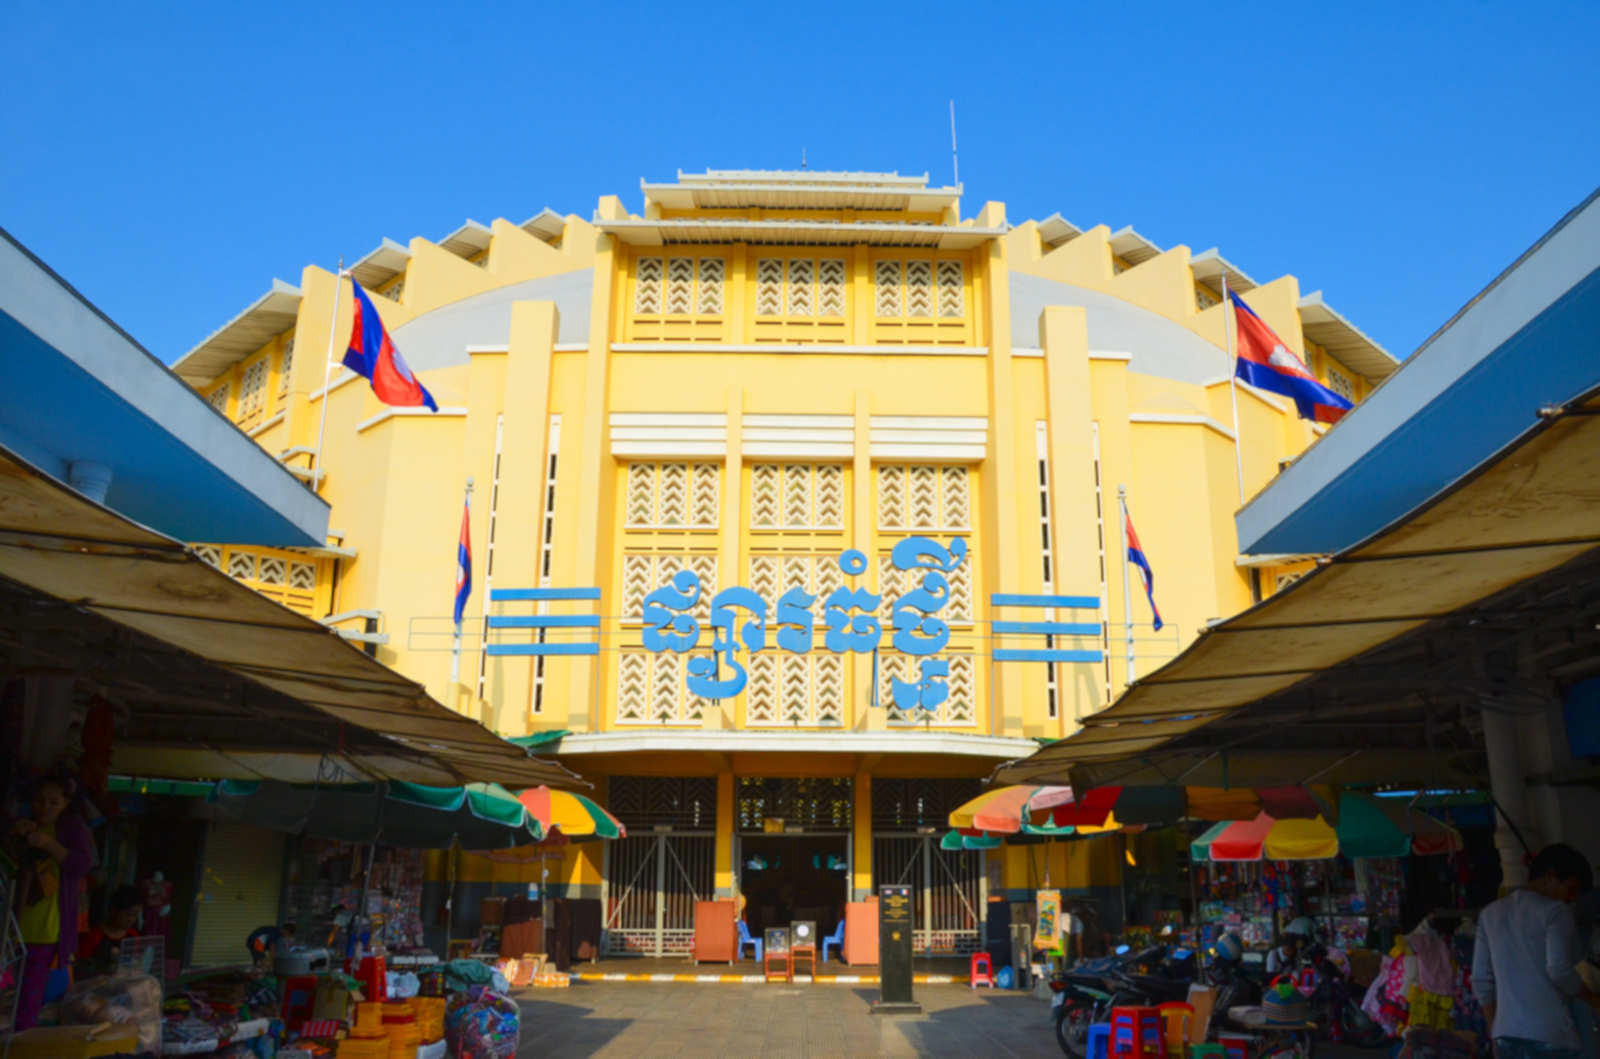 Những điểm mua sắm ở Campuchia - Chợ mới (Central Market E)